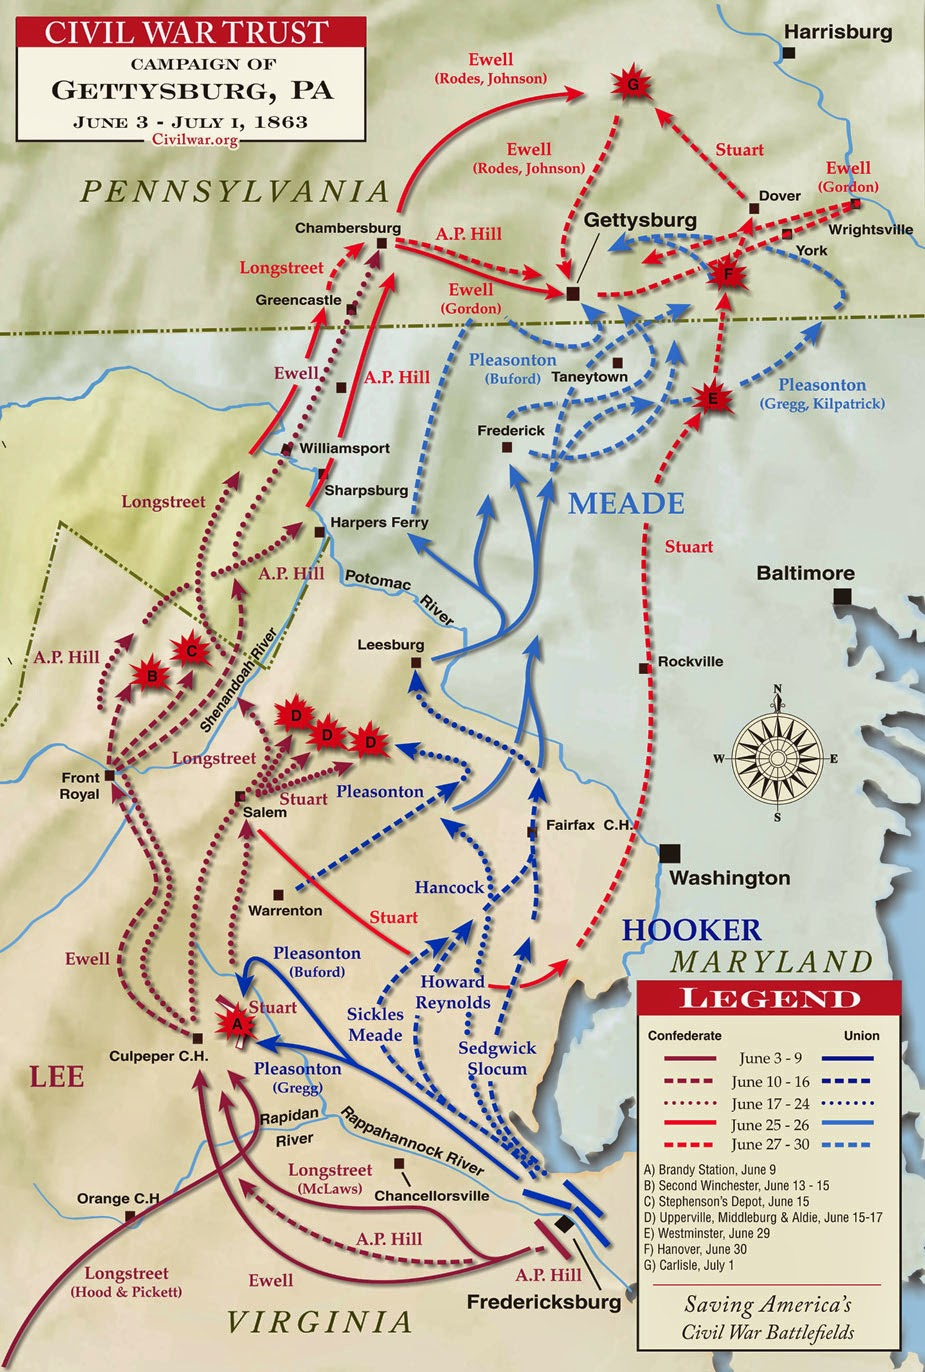 Gettysburg campain map